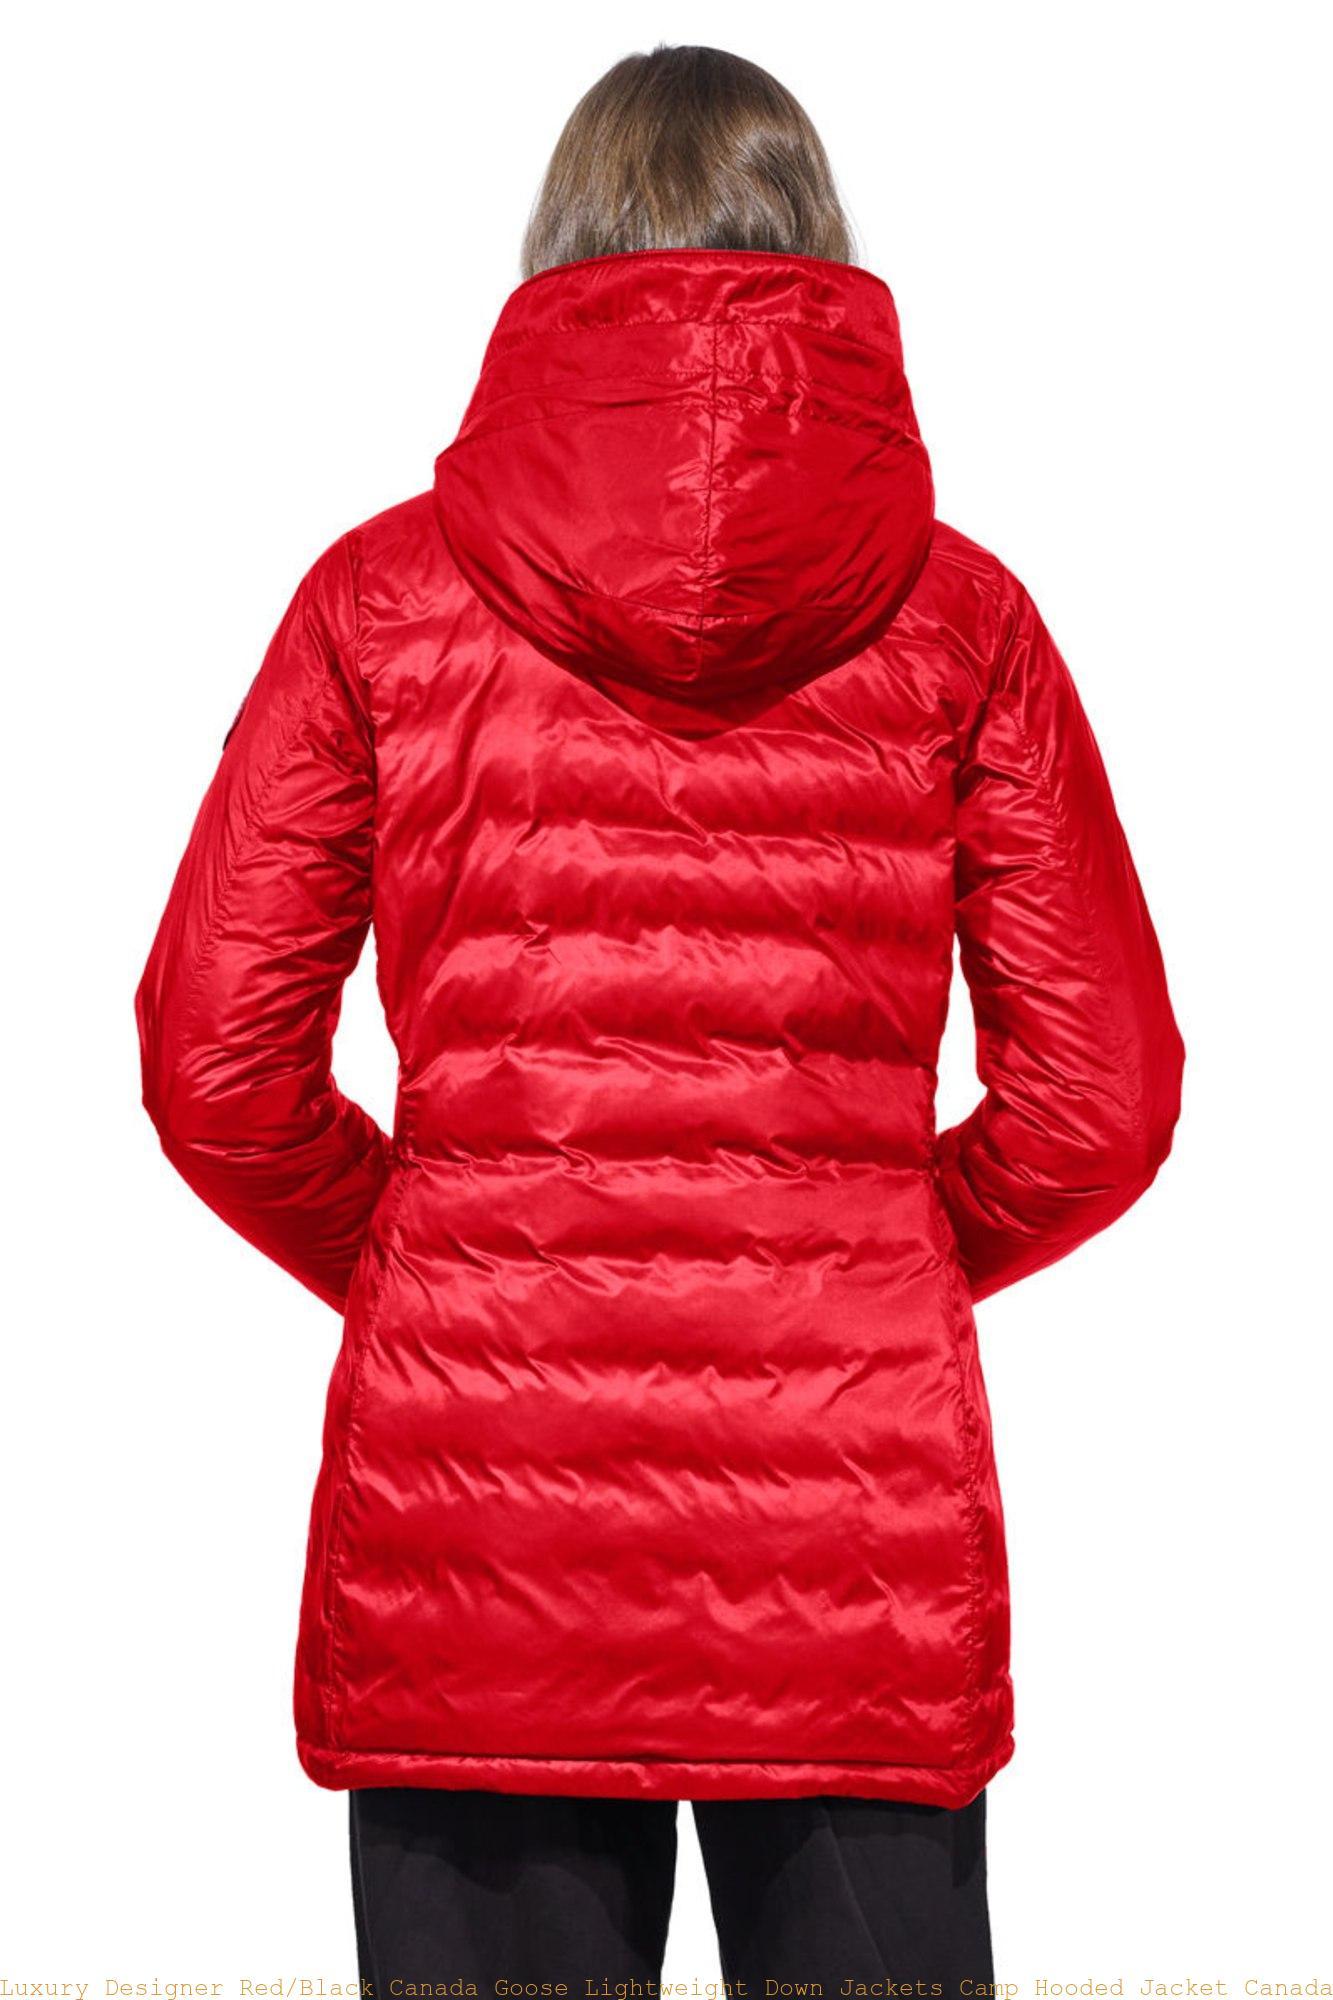 59969734b Luxury Designer Red/Black Canada Goose Lightweight Down Jackets Camp Hooded  Jacket Canada Goose Clothing Uk 5061L